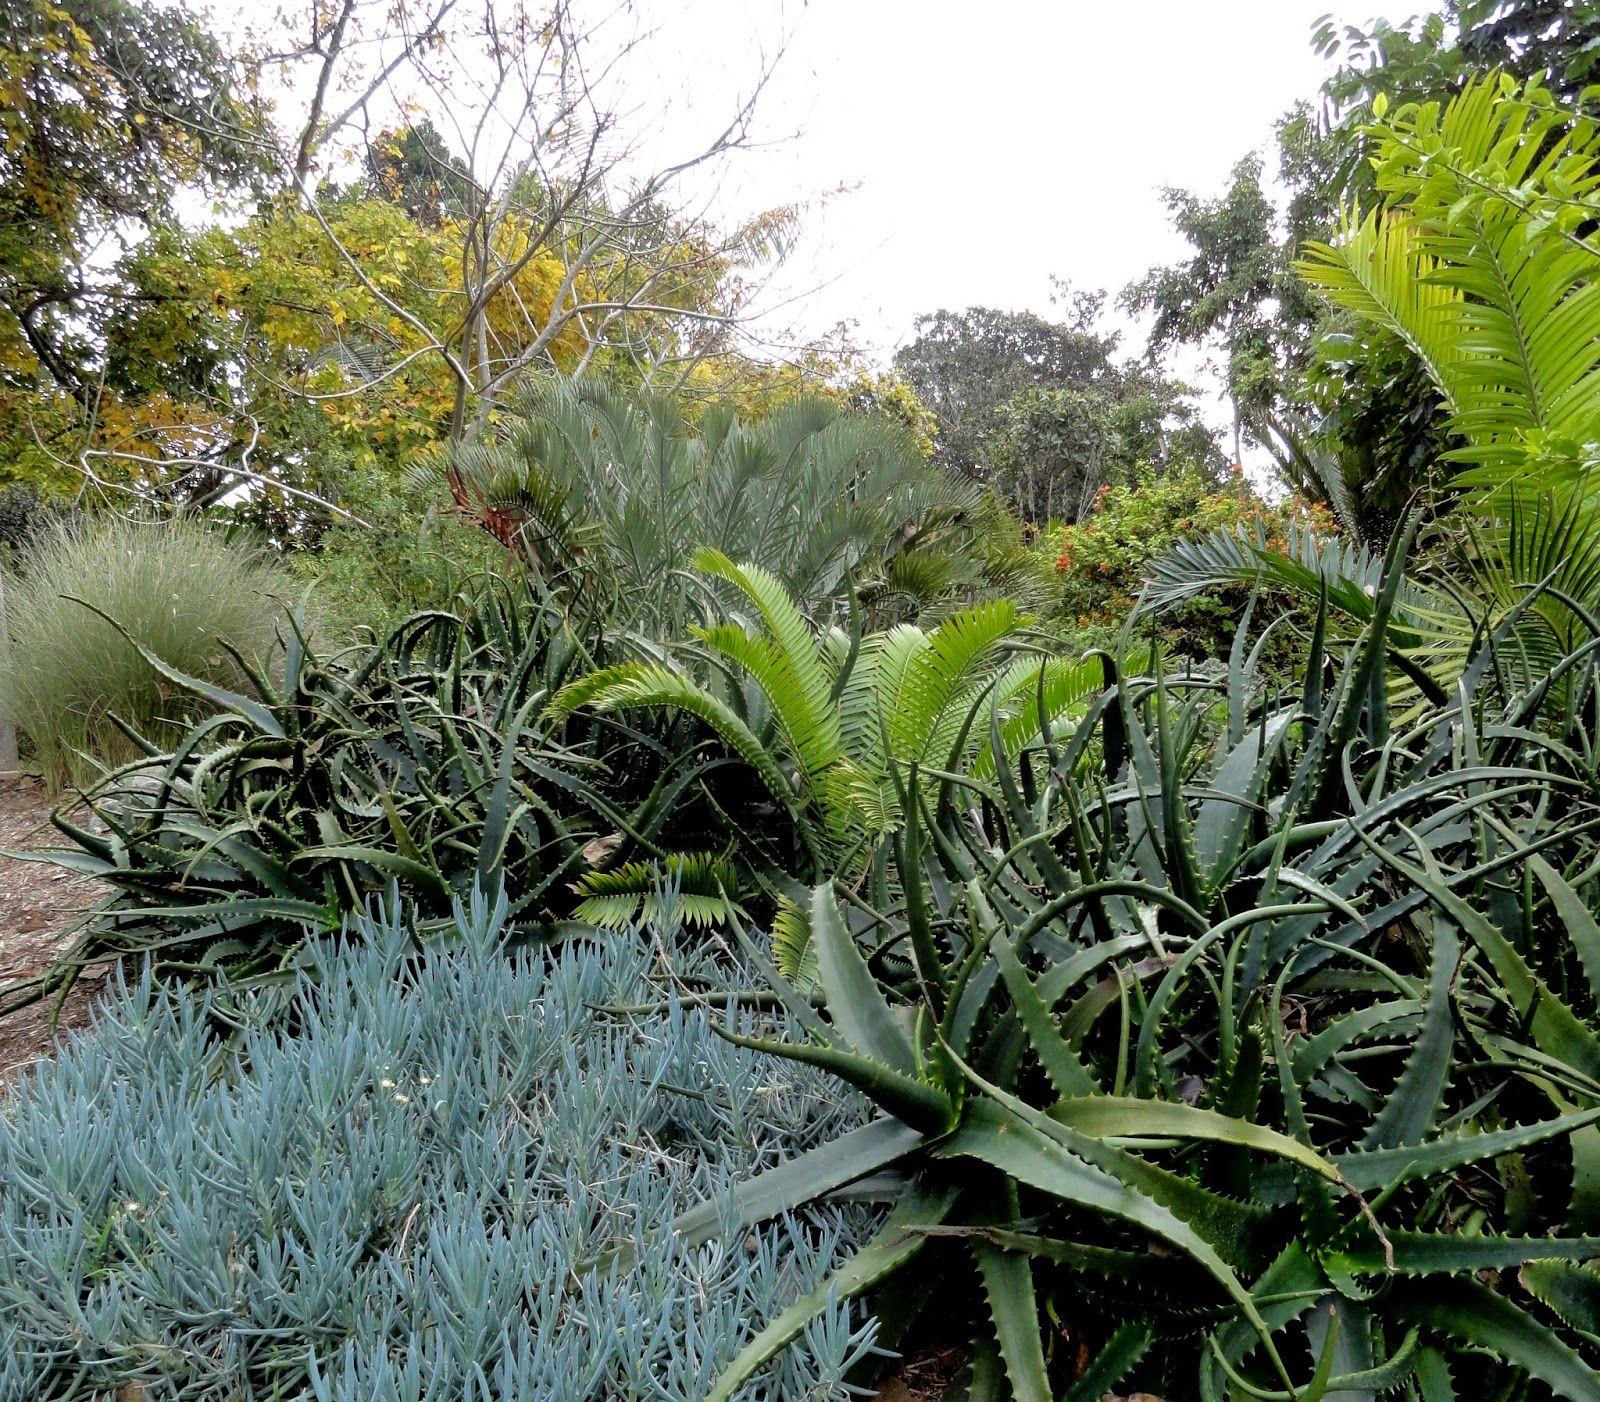 f82876f1d84180cbdba05579cc9a8128 - San Diego Botanical Gardens Free Tuesday